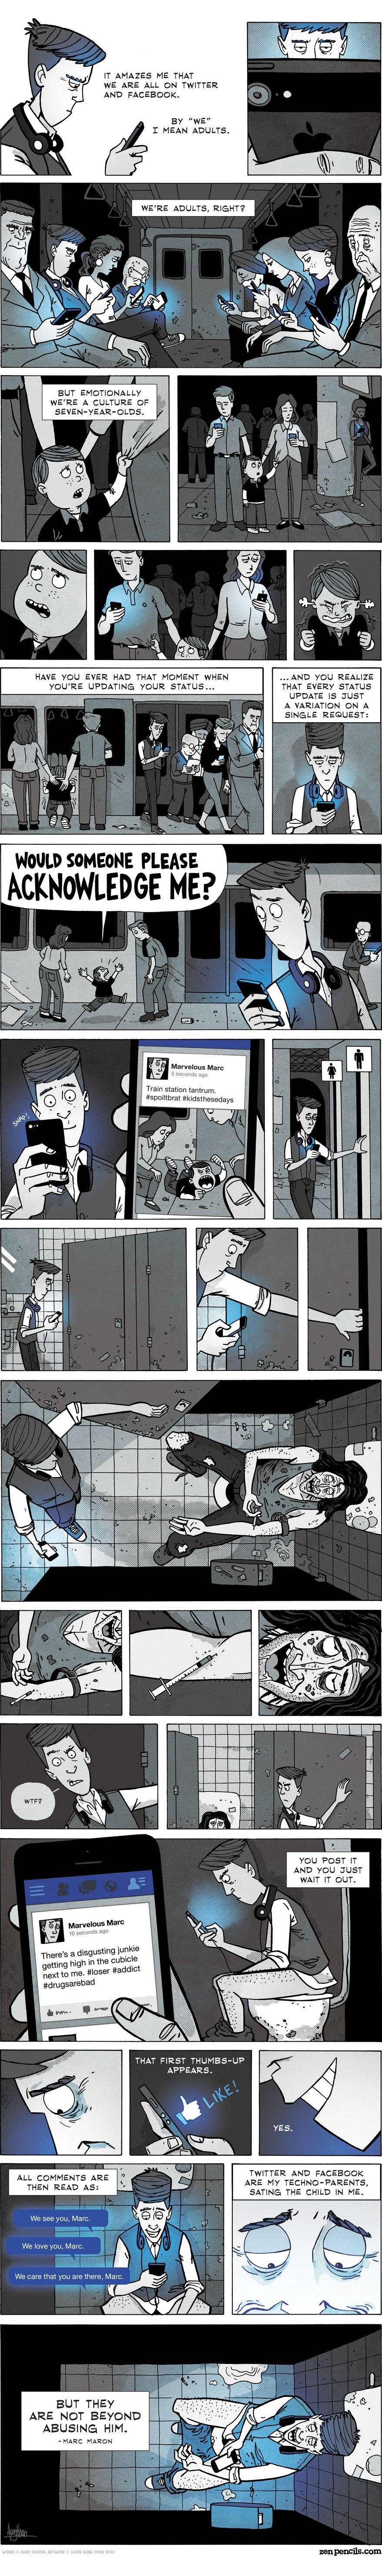 comic-social-media-generation-facebook-user